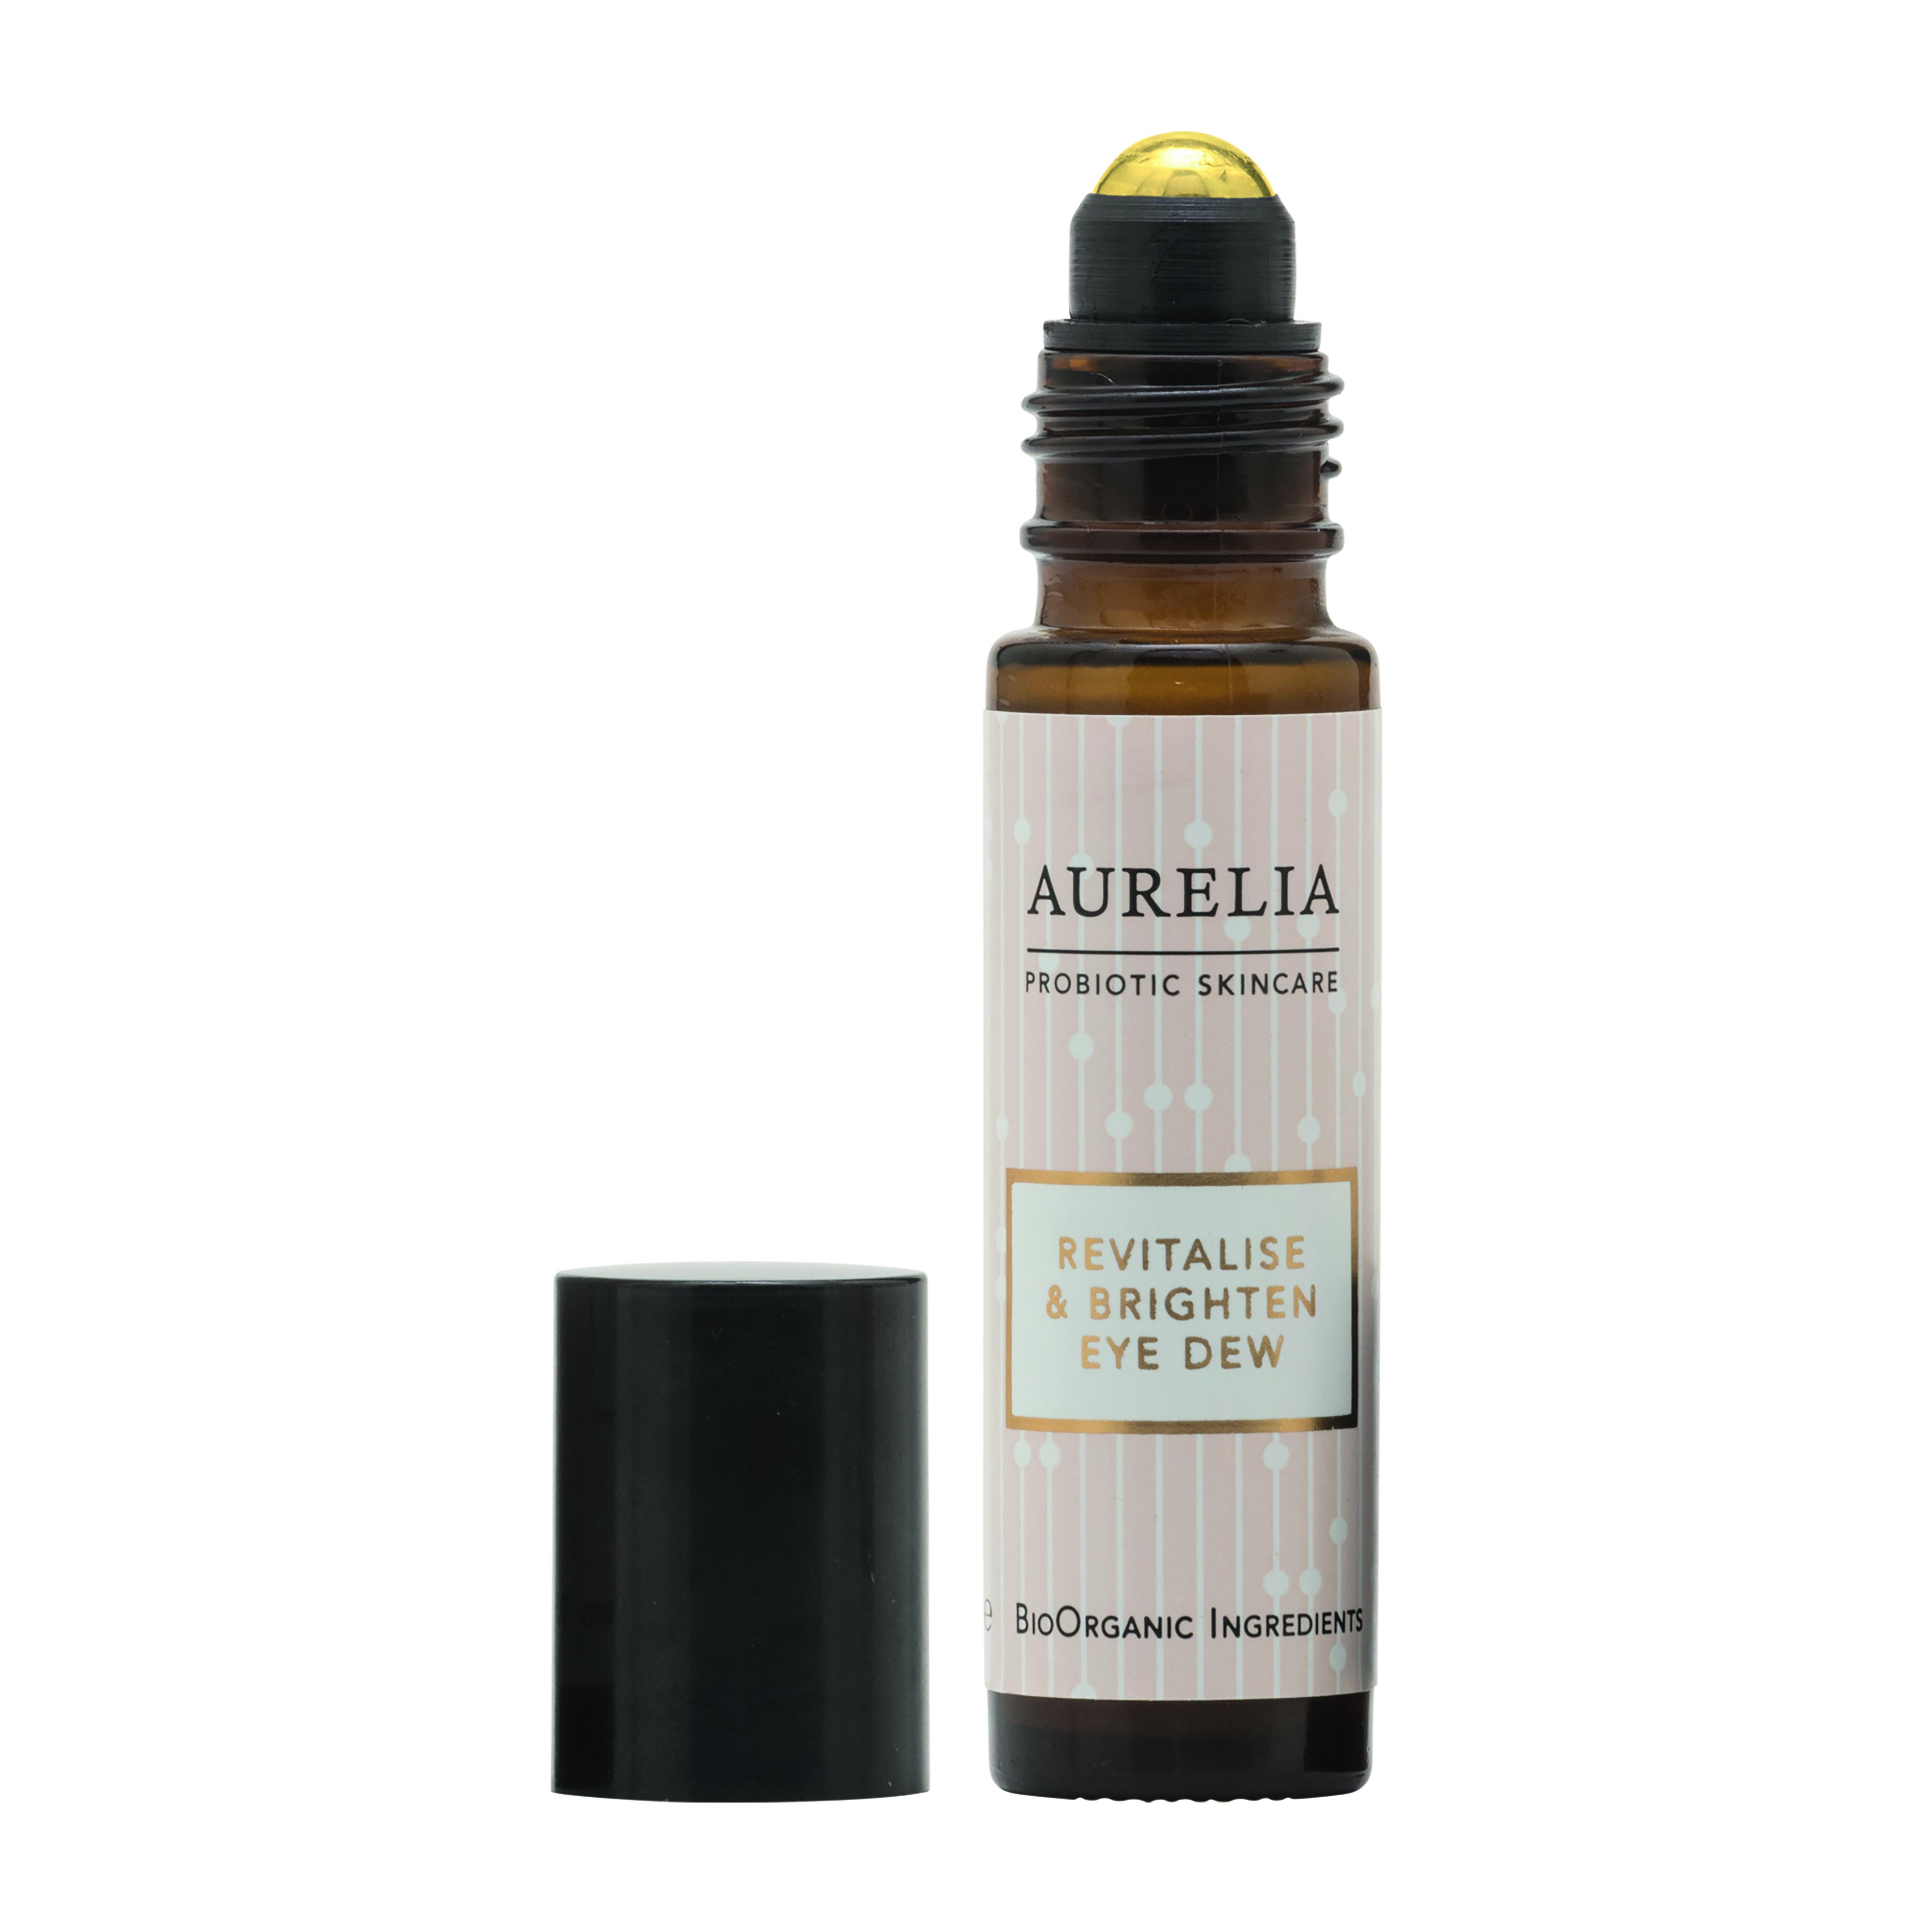 Aurelia Revitalise and Brighte Aurelia Revitalise and Brighten Eye Dew Eye Cream: